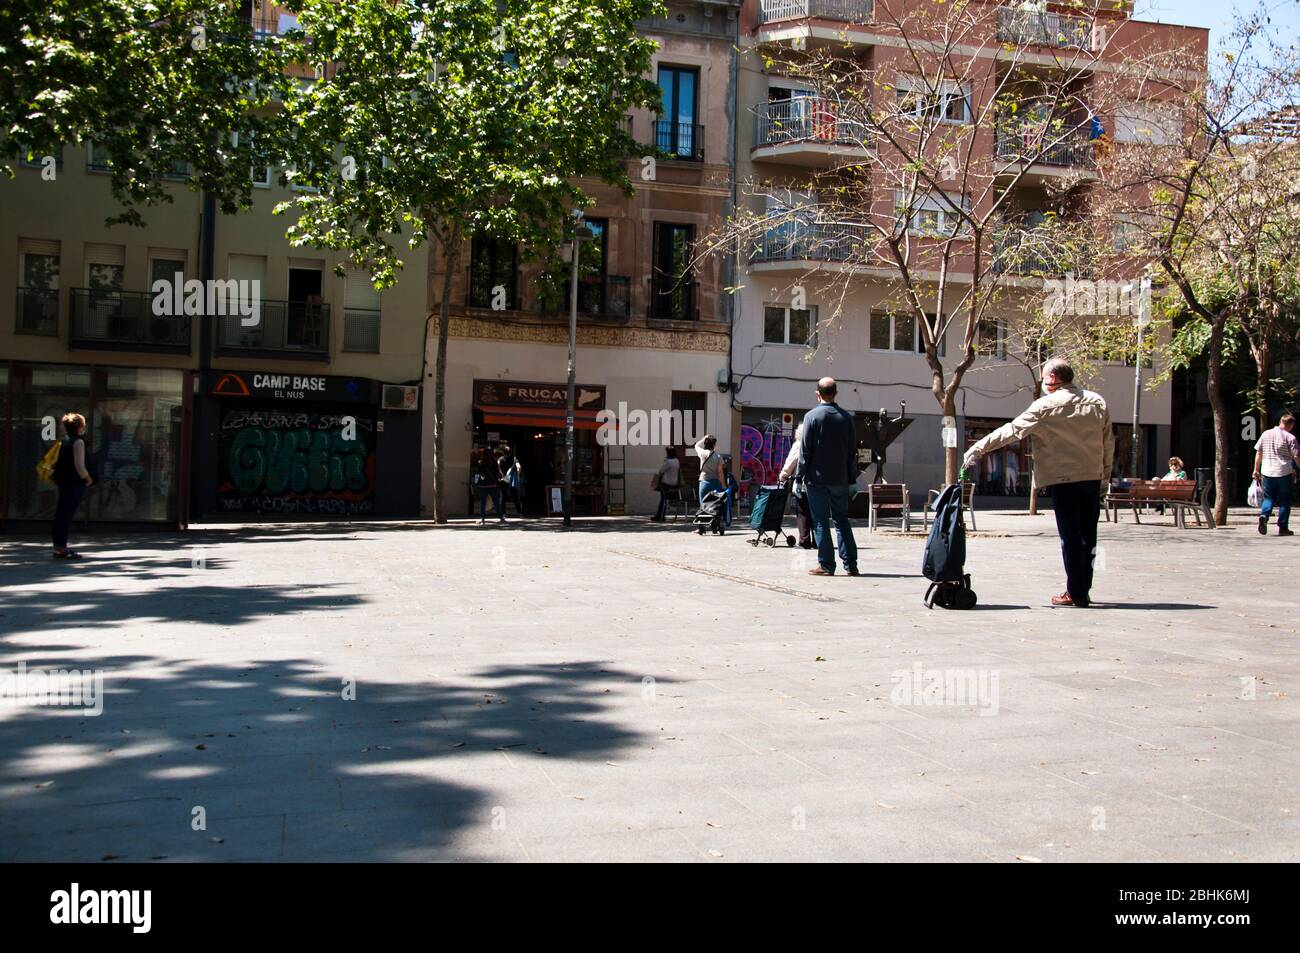 Personas guardan distancia esperando para comprar en una frutería, Cuarentena 25 abril 2020, Gracia District, Barcelona, España. Stock Photo